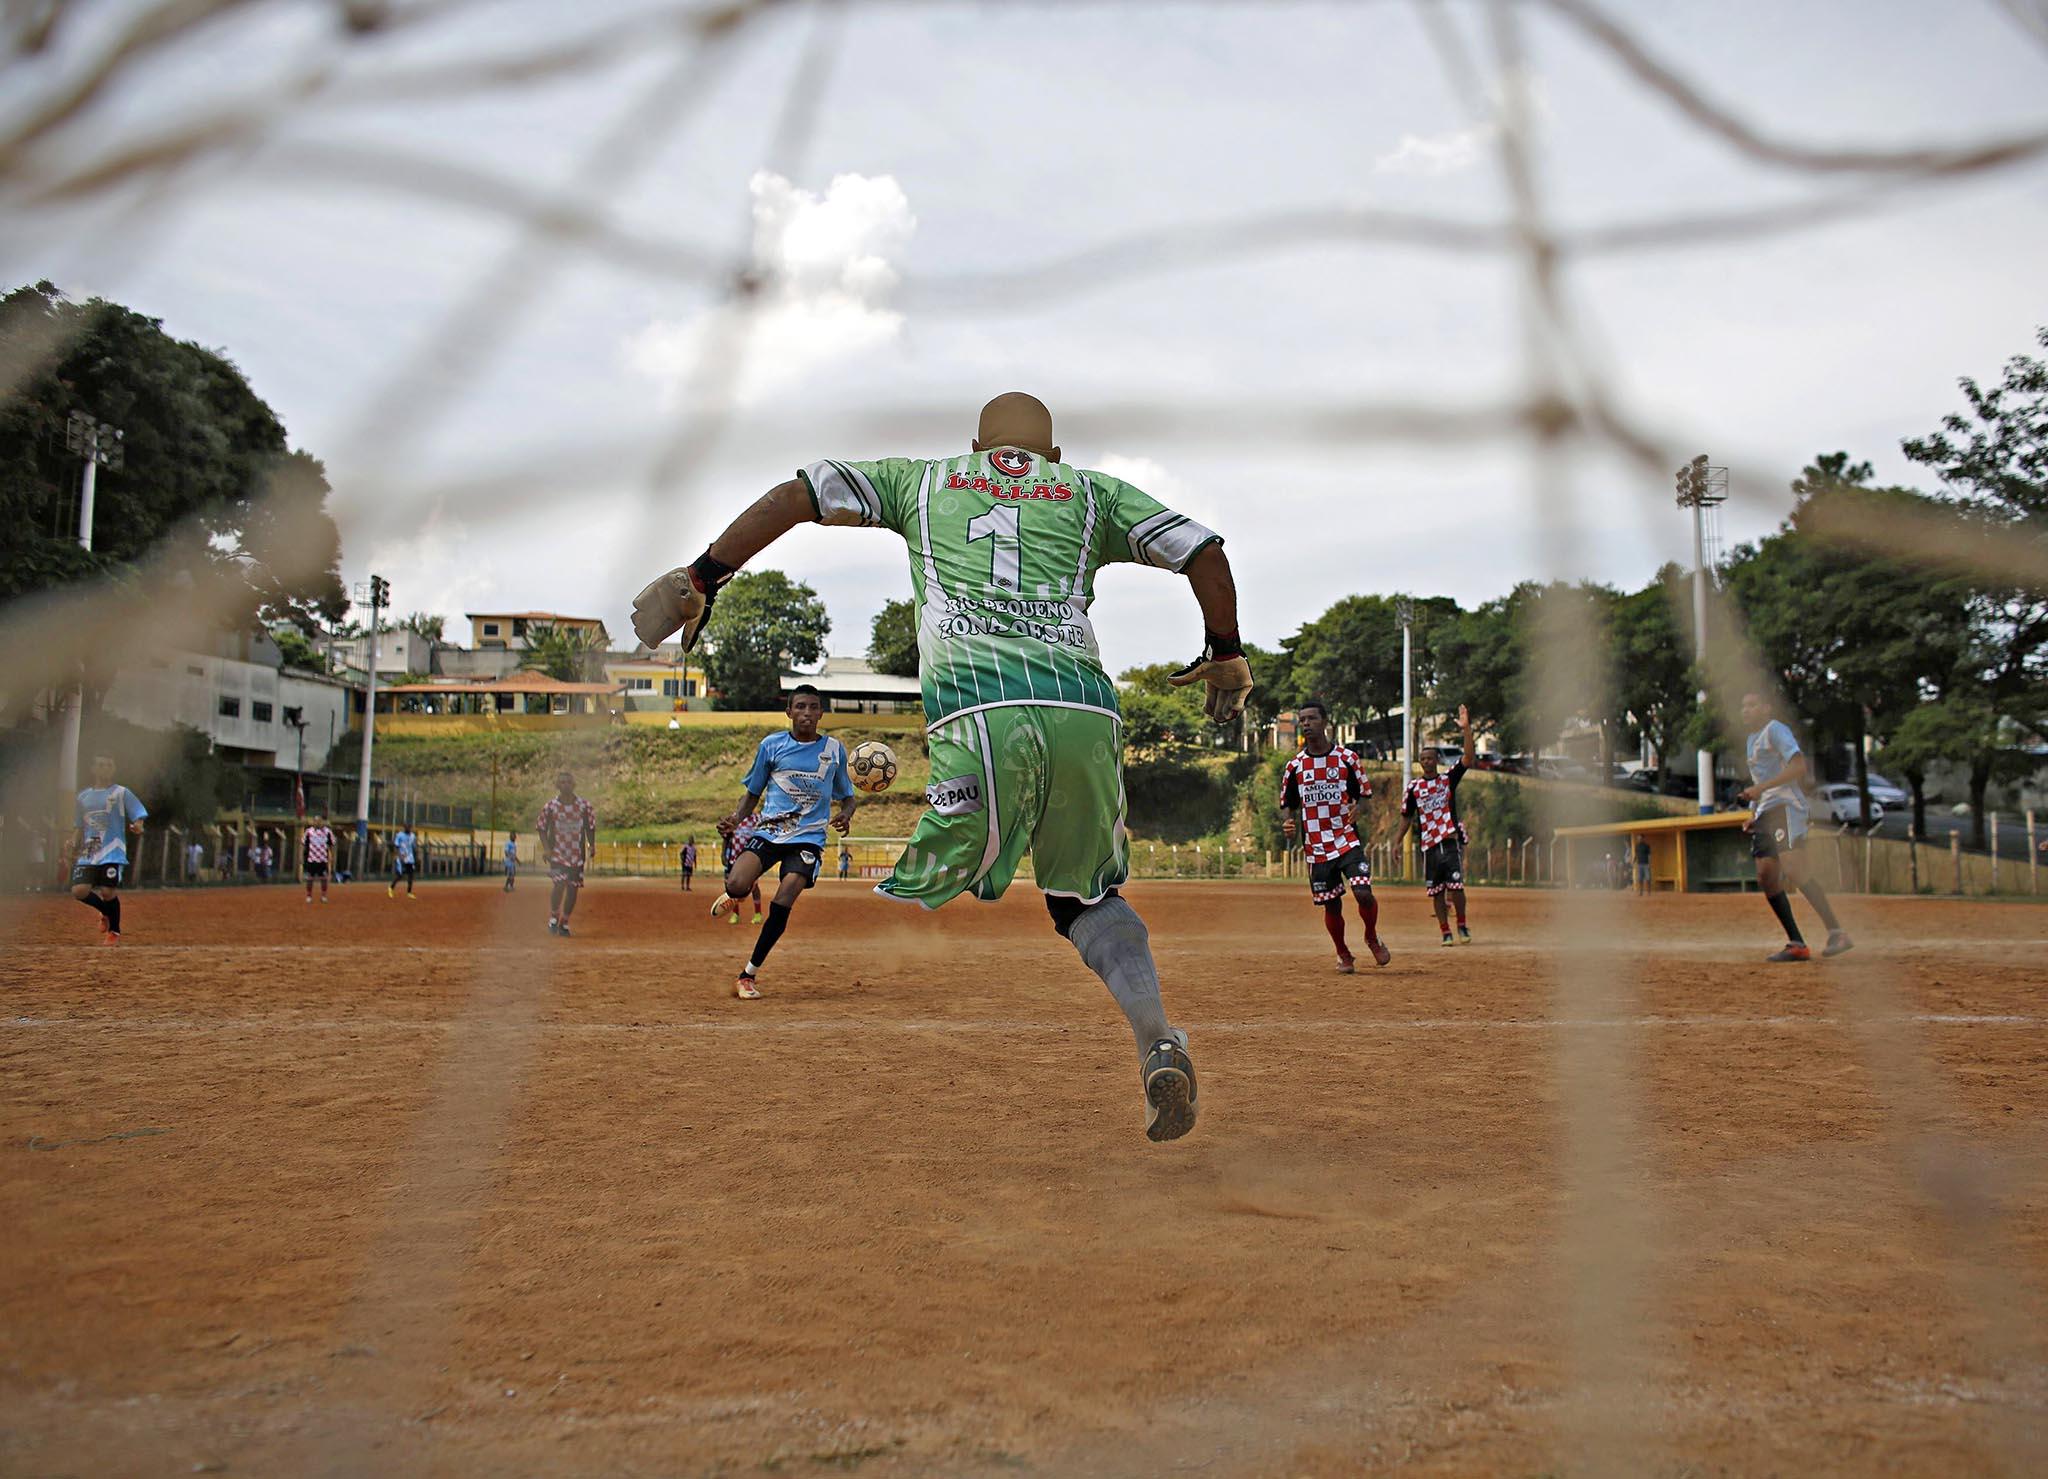 Moleque Travesso soccer club's goalkeeper Alexandre Toledo